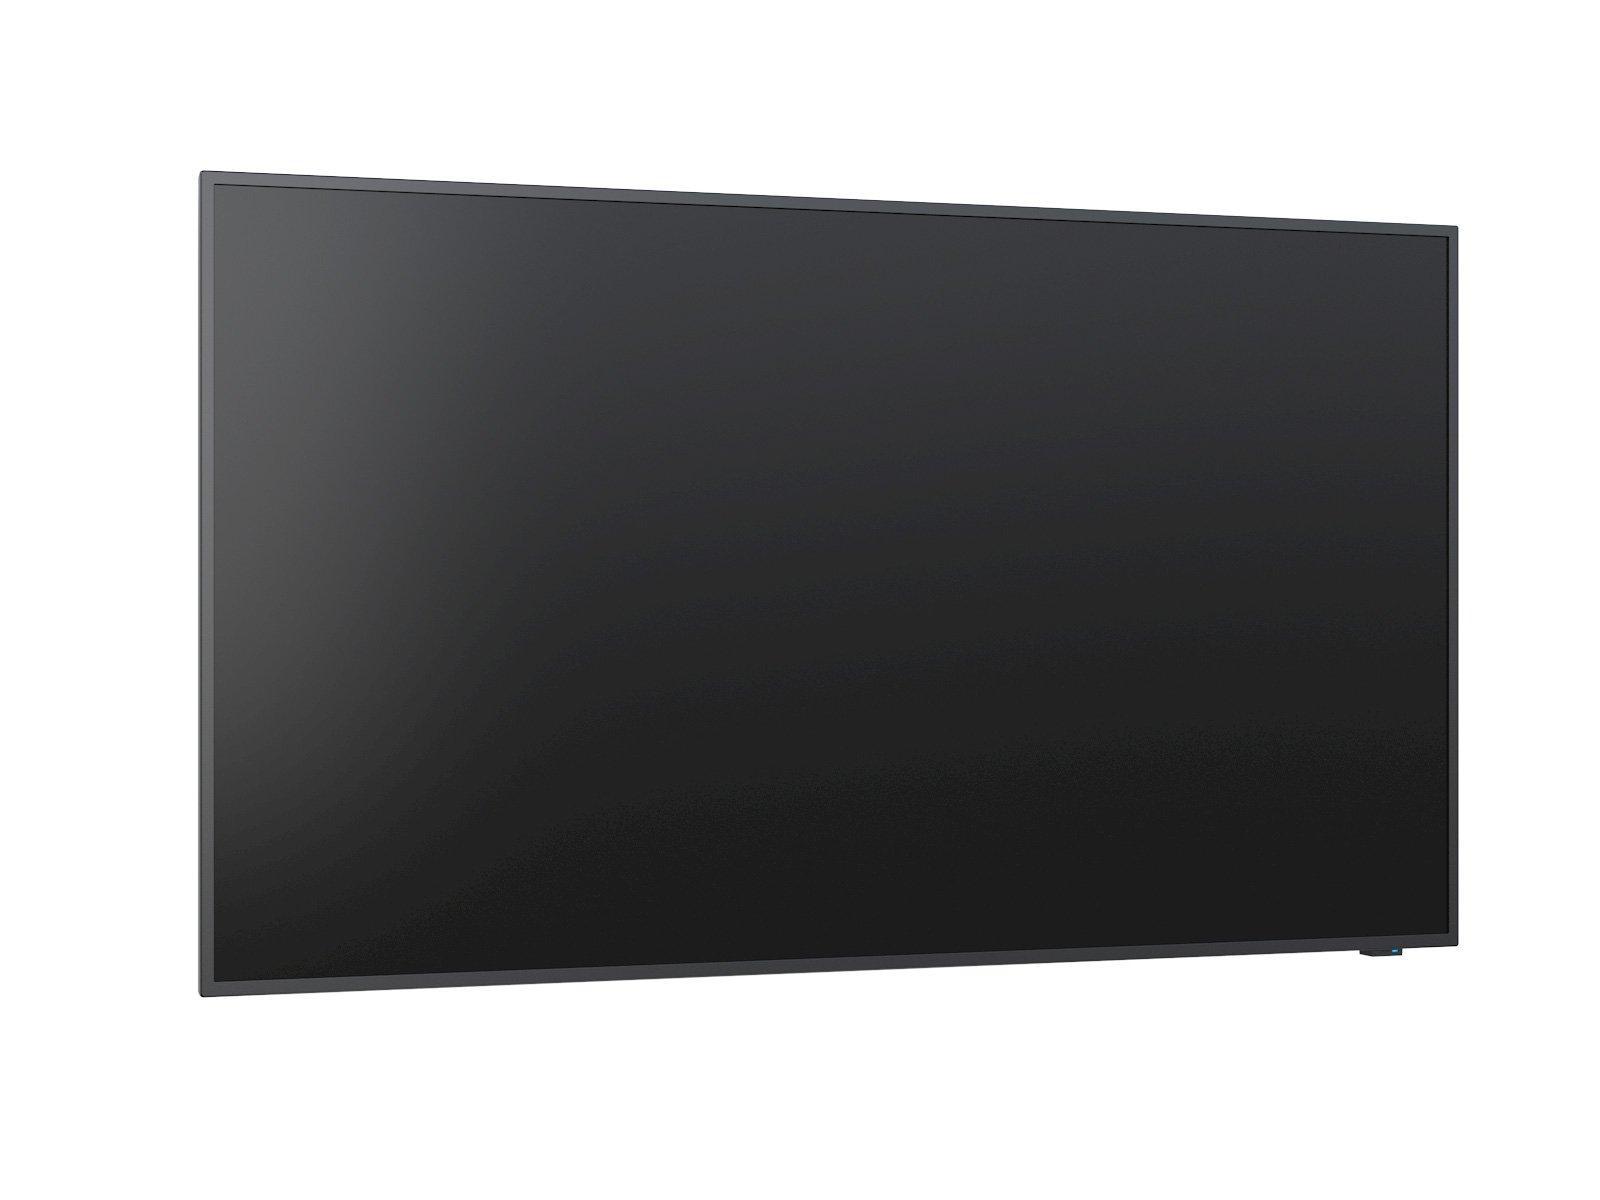 "Широкоформатен дисплей NEC MultiSync E438, 43"", UHD, 350cd/m2, Direct LED backlight, 16/7 proof, Media Player-4"